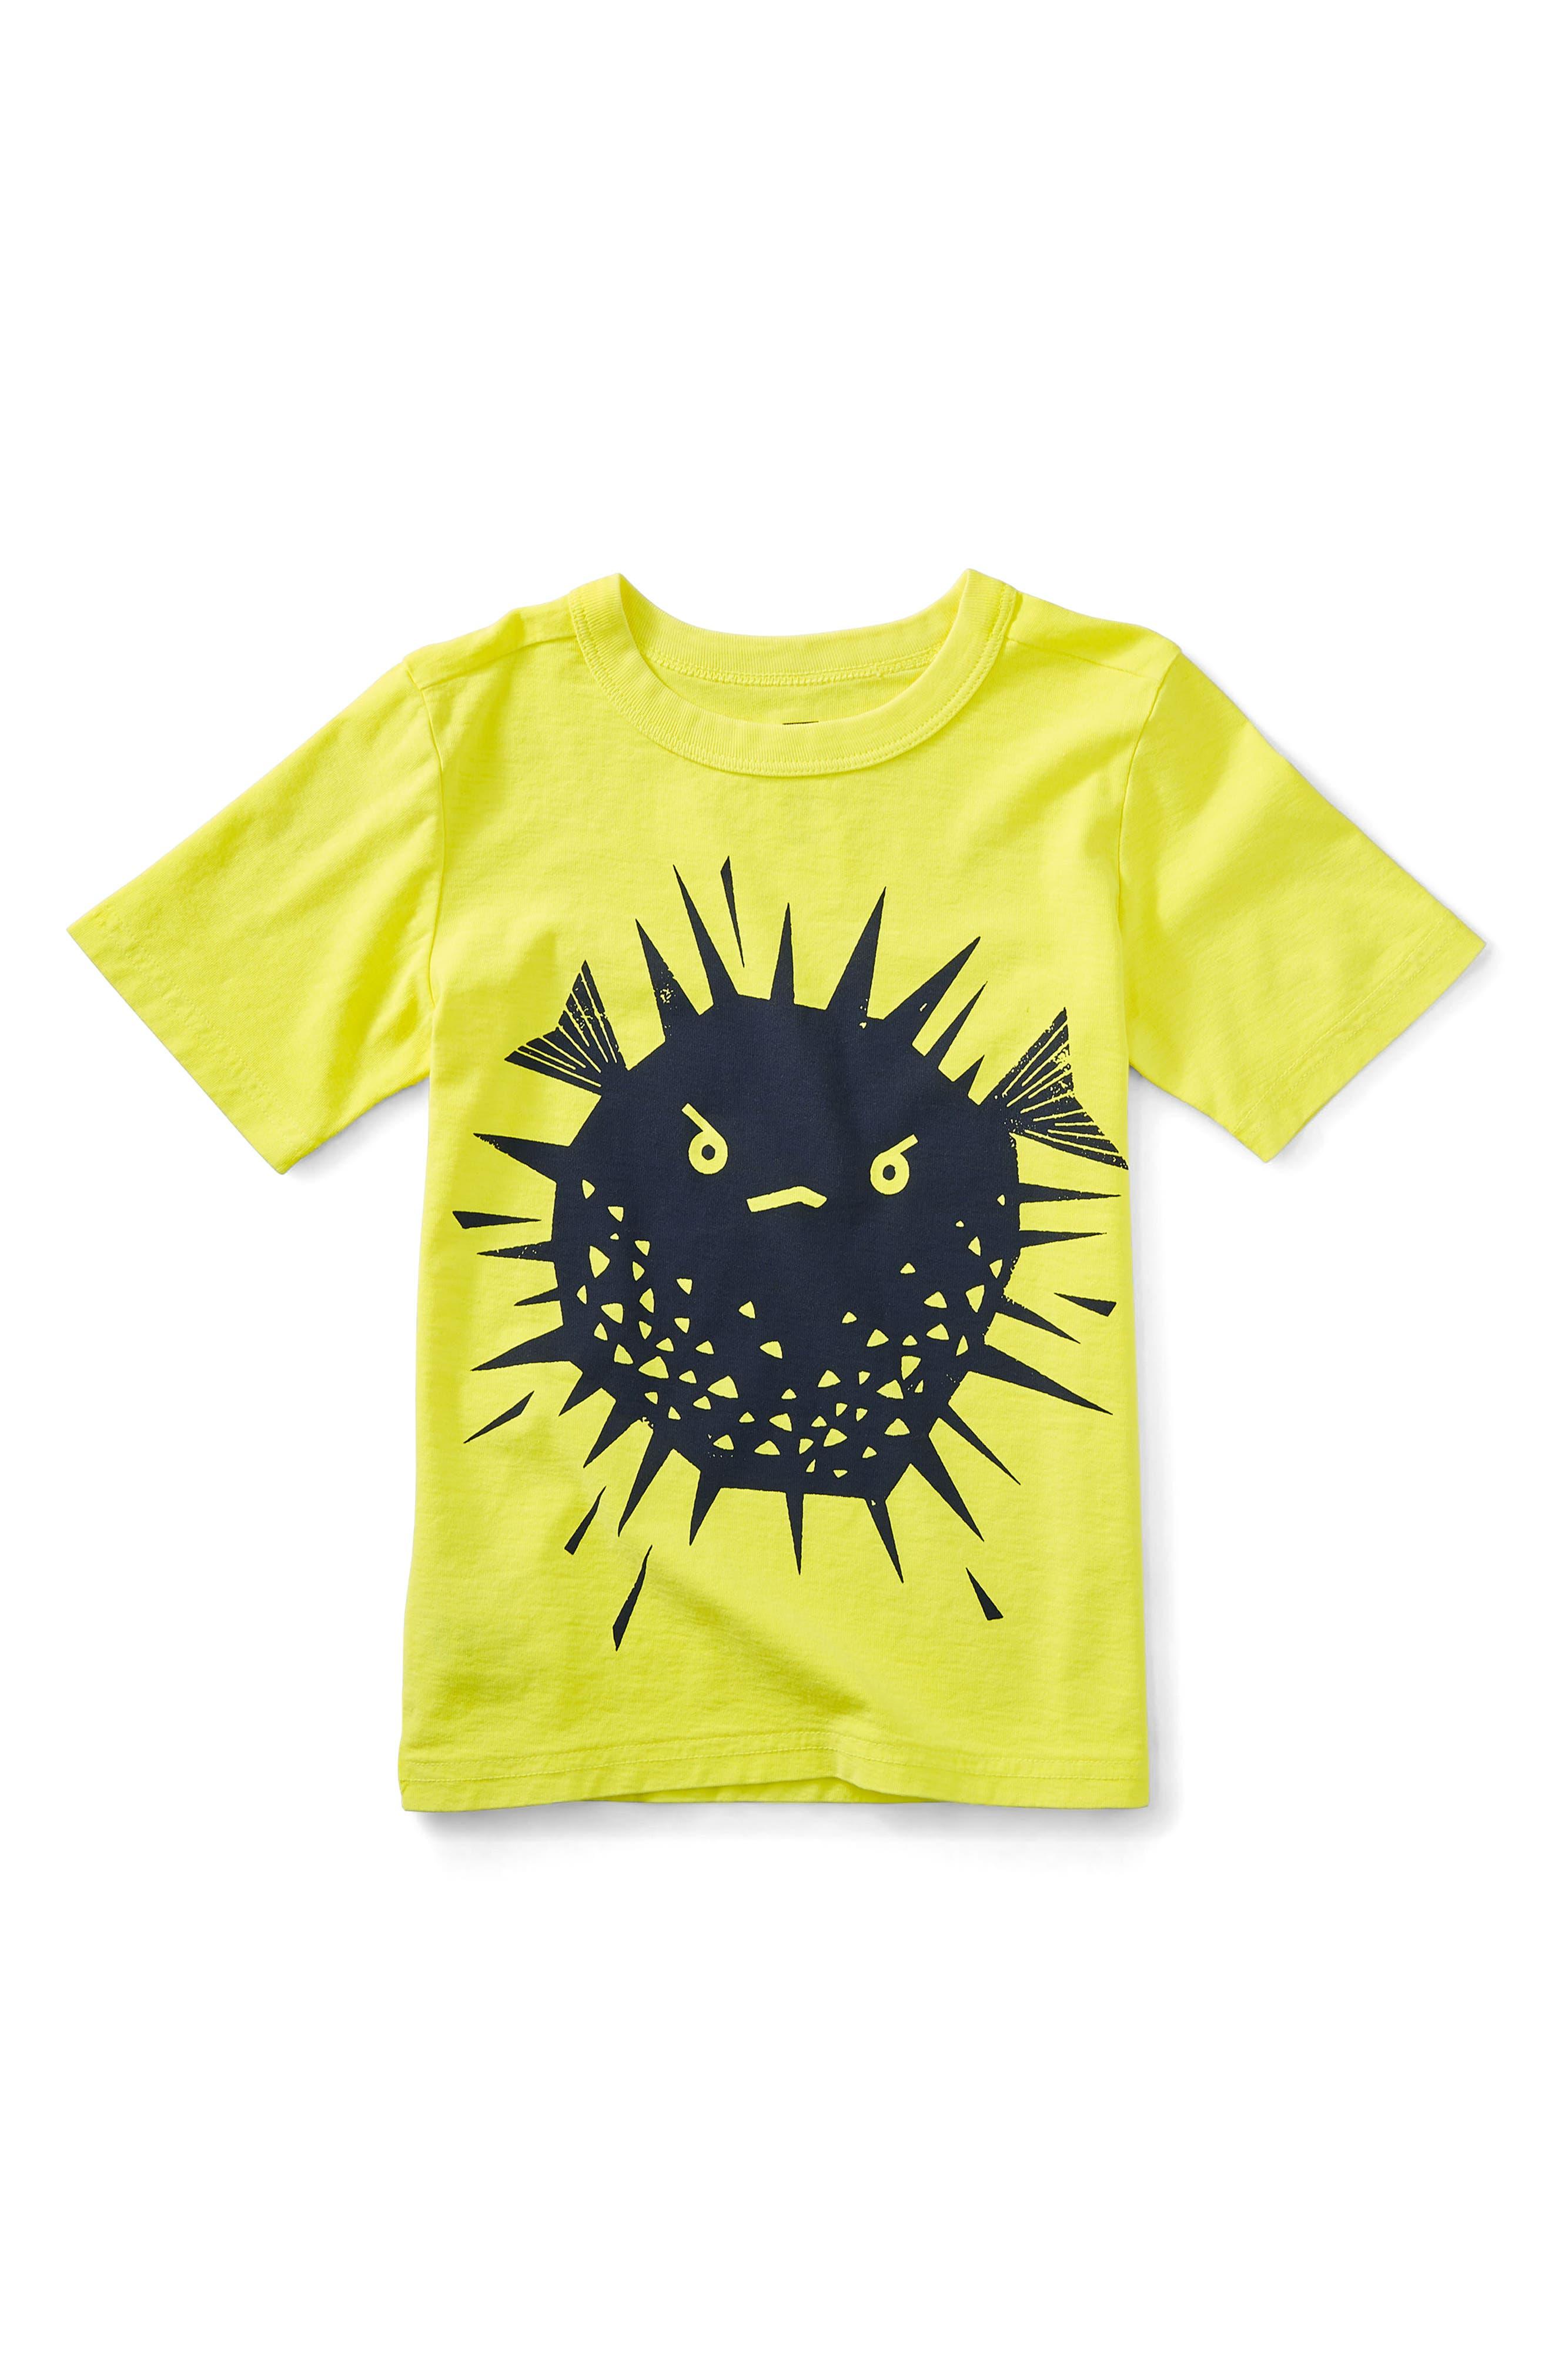 Puffer Fish Graphic T-Shirt,                             Main thumbnail 1, color,                             764